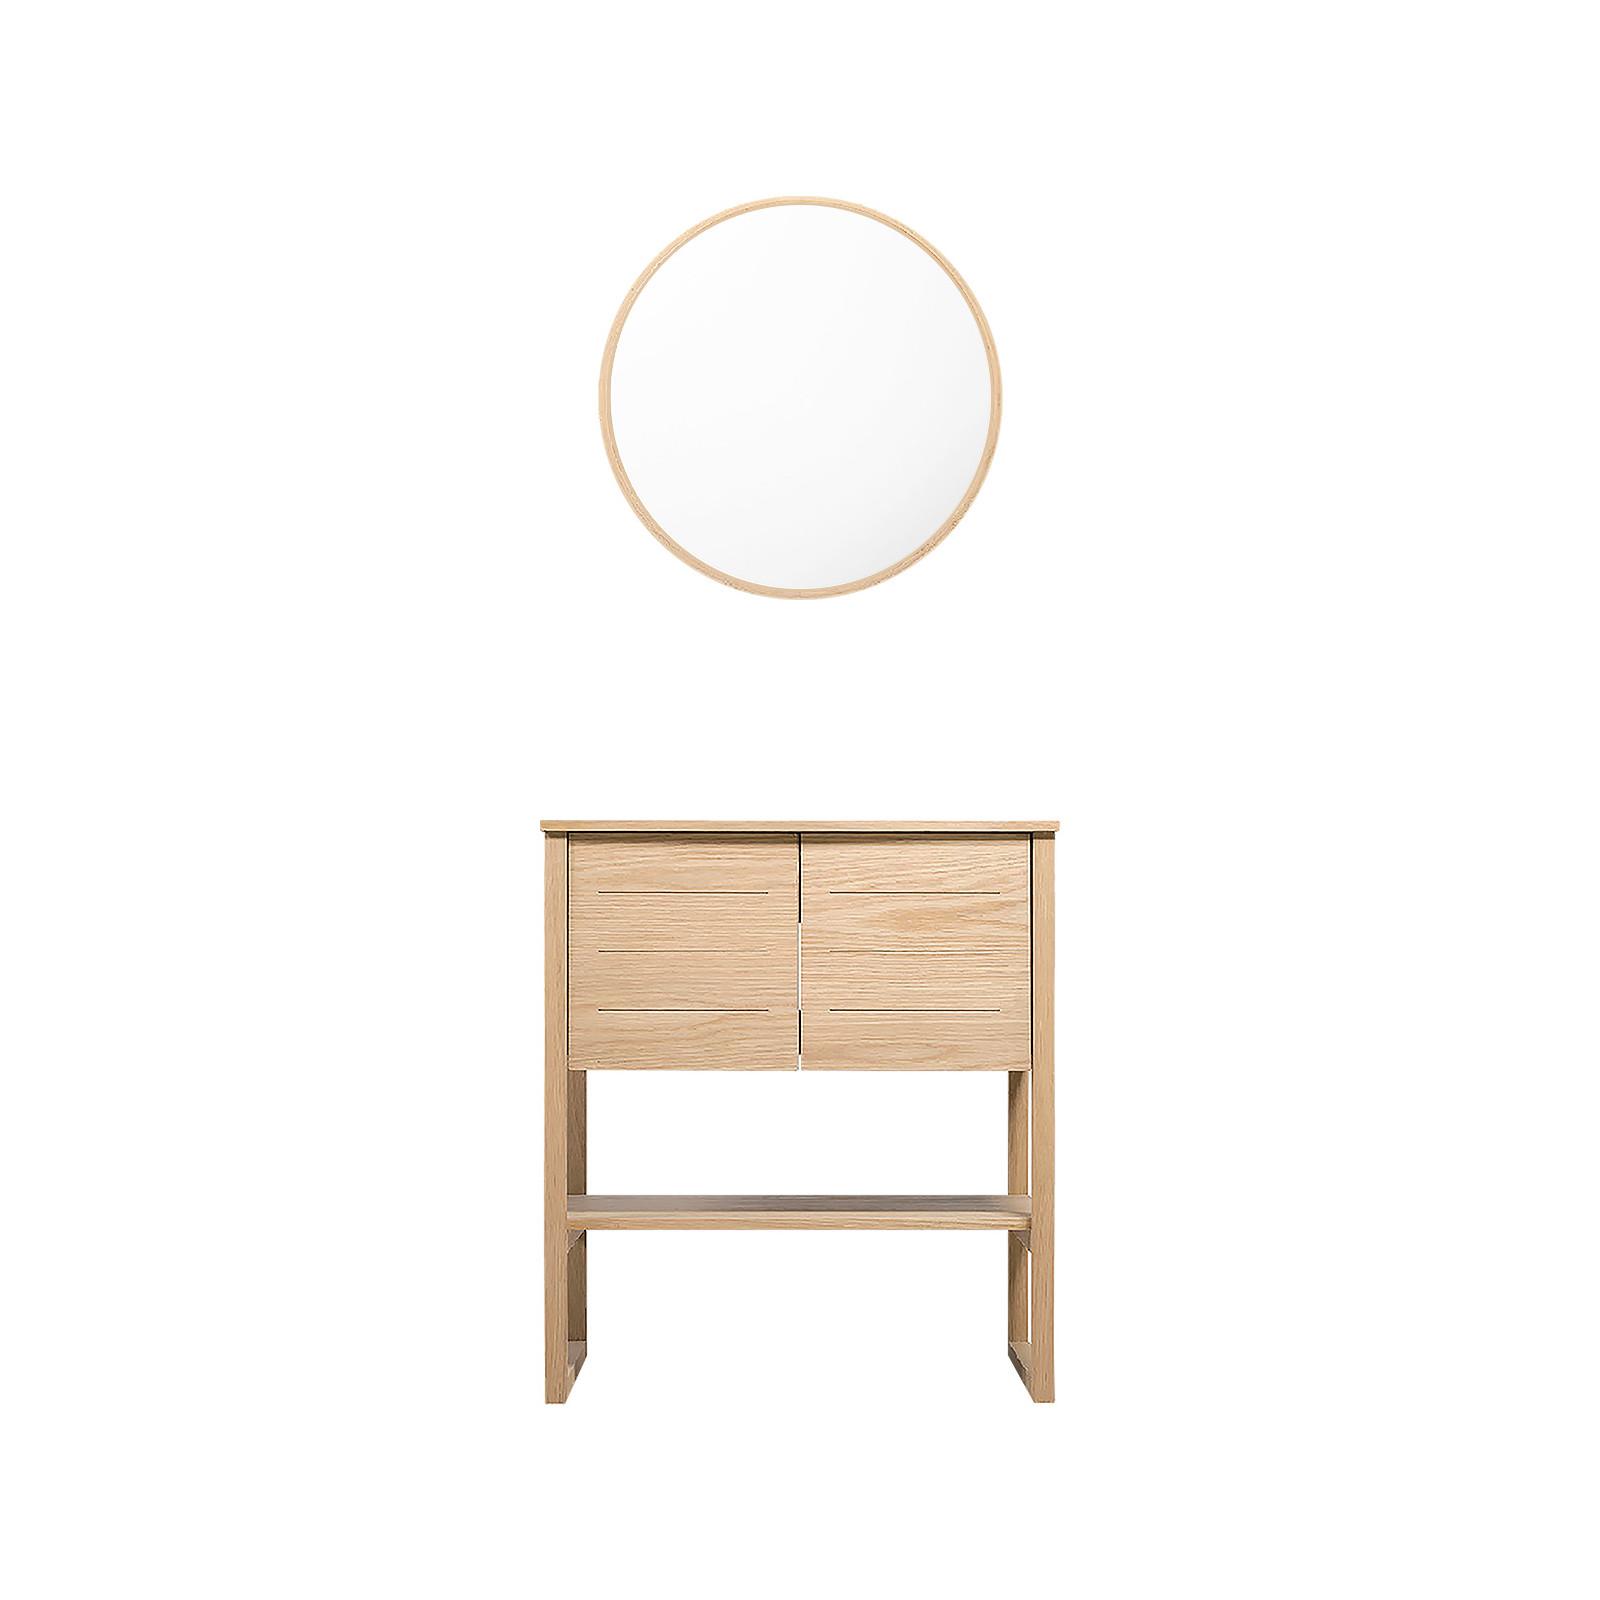 Meuble de Salle De Bain Chêne 70 cm ATOLL + Miroir  Rond en Bois VALI D60 cm